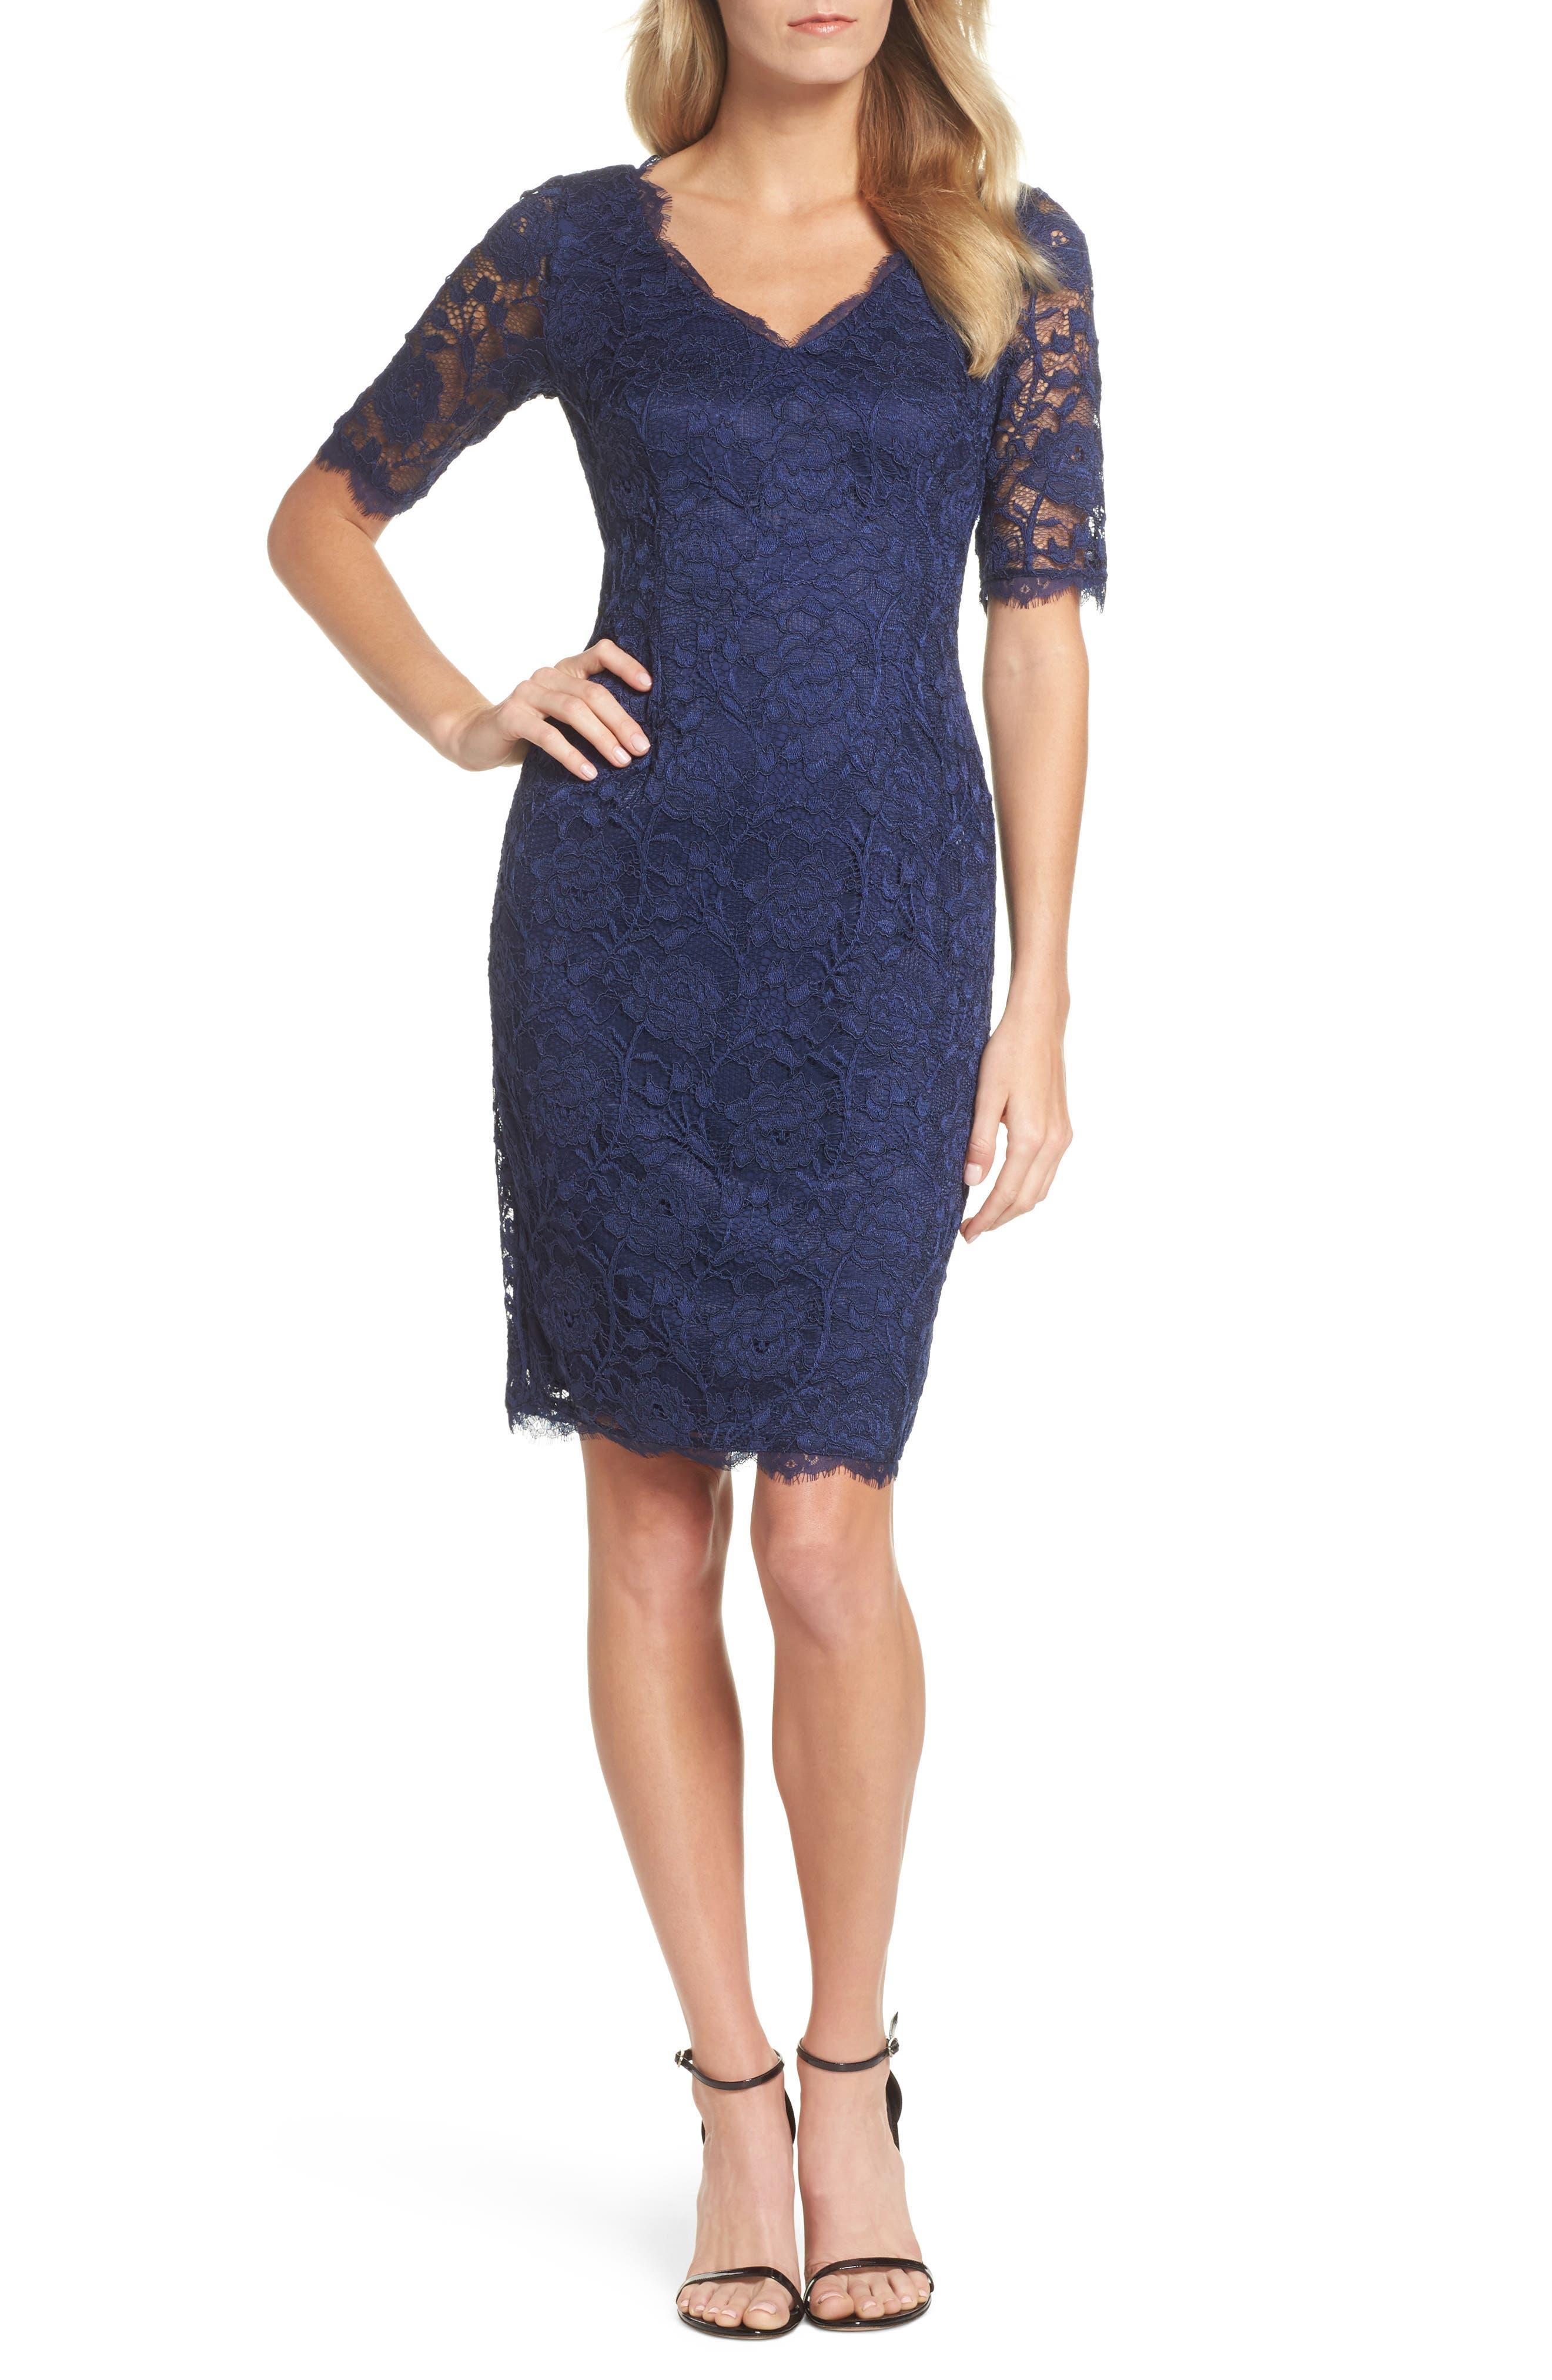 Adrianna Papell Rose Lace Sheath Dress